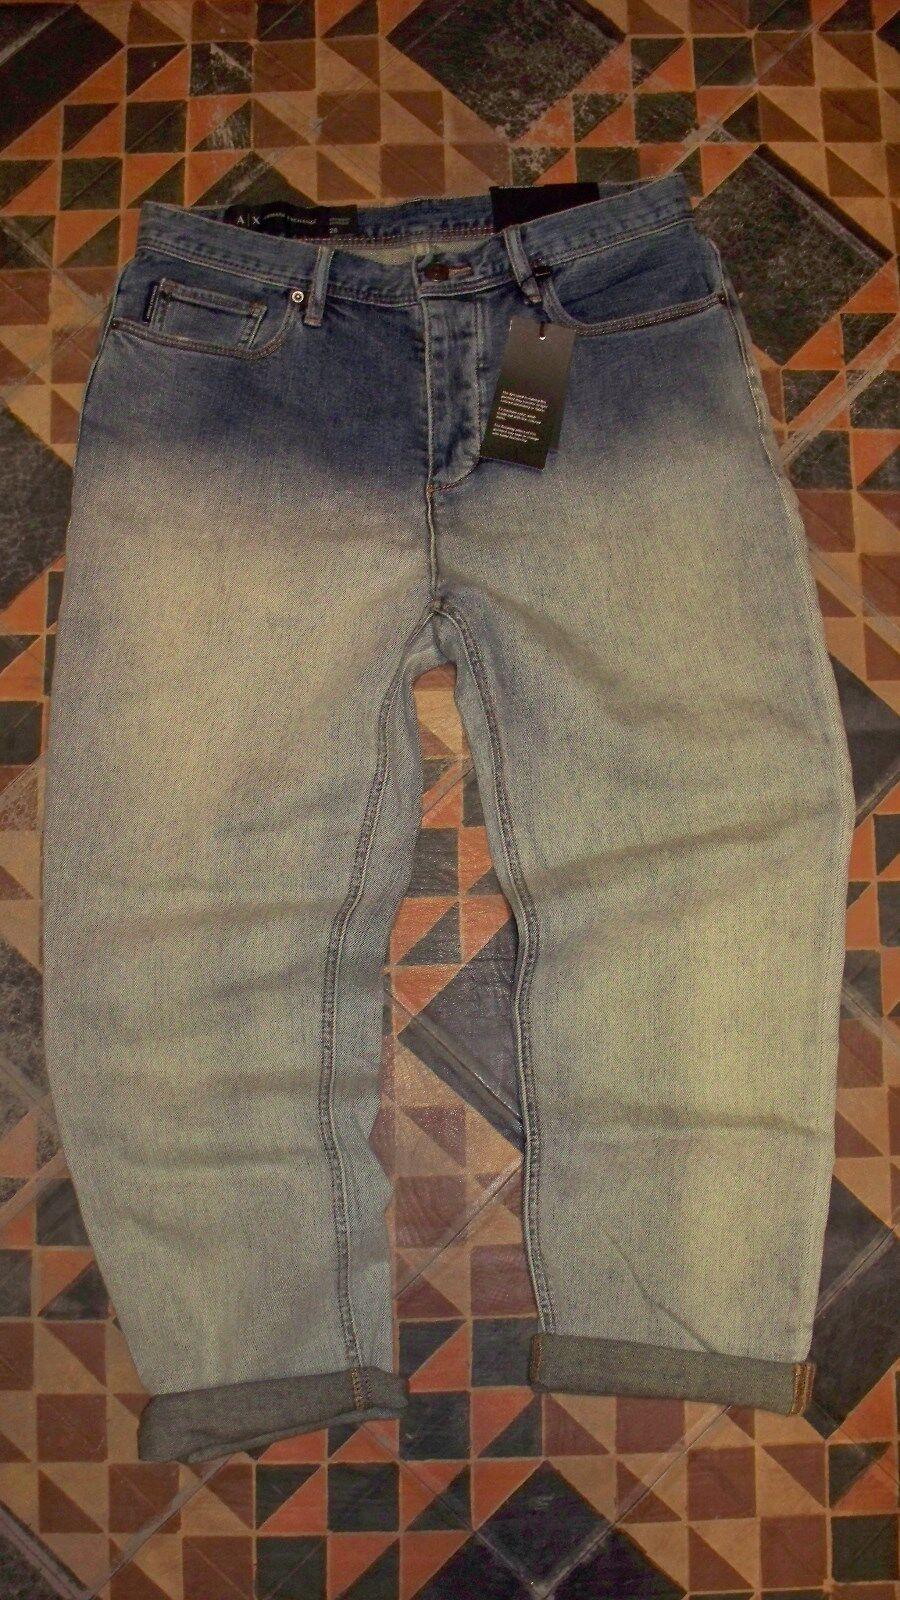 WOW Women's Faded Denim Jeans ARMANI A X EXCHANGE Boyfriend 31 Cropped  NWT